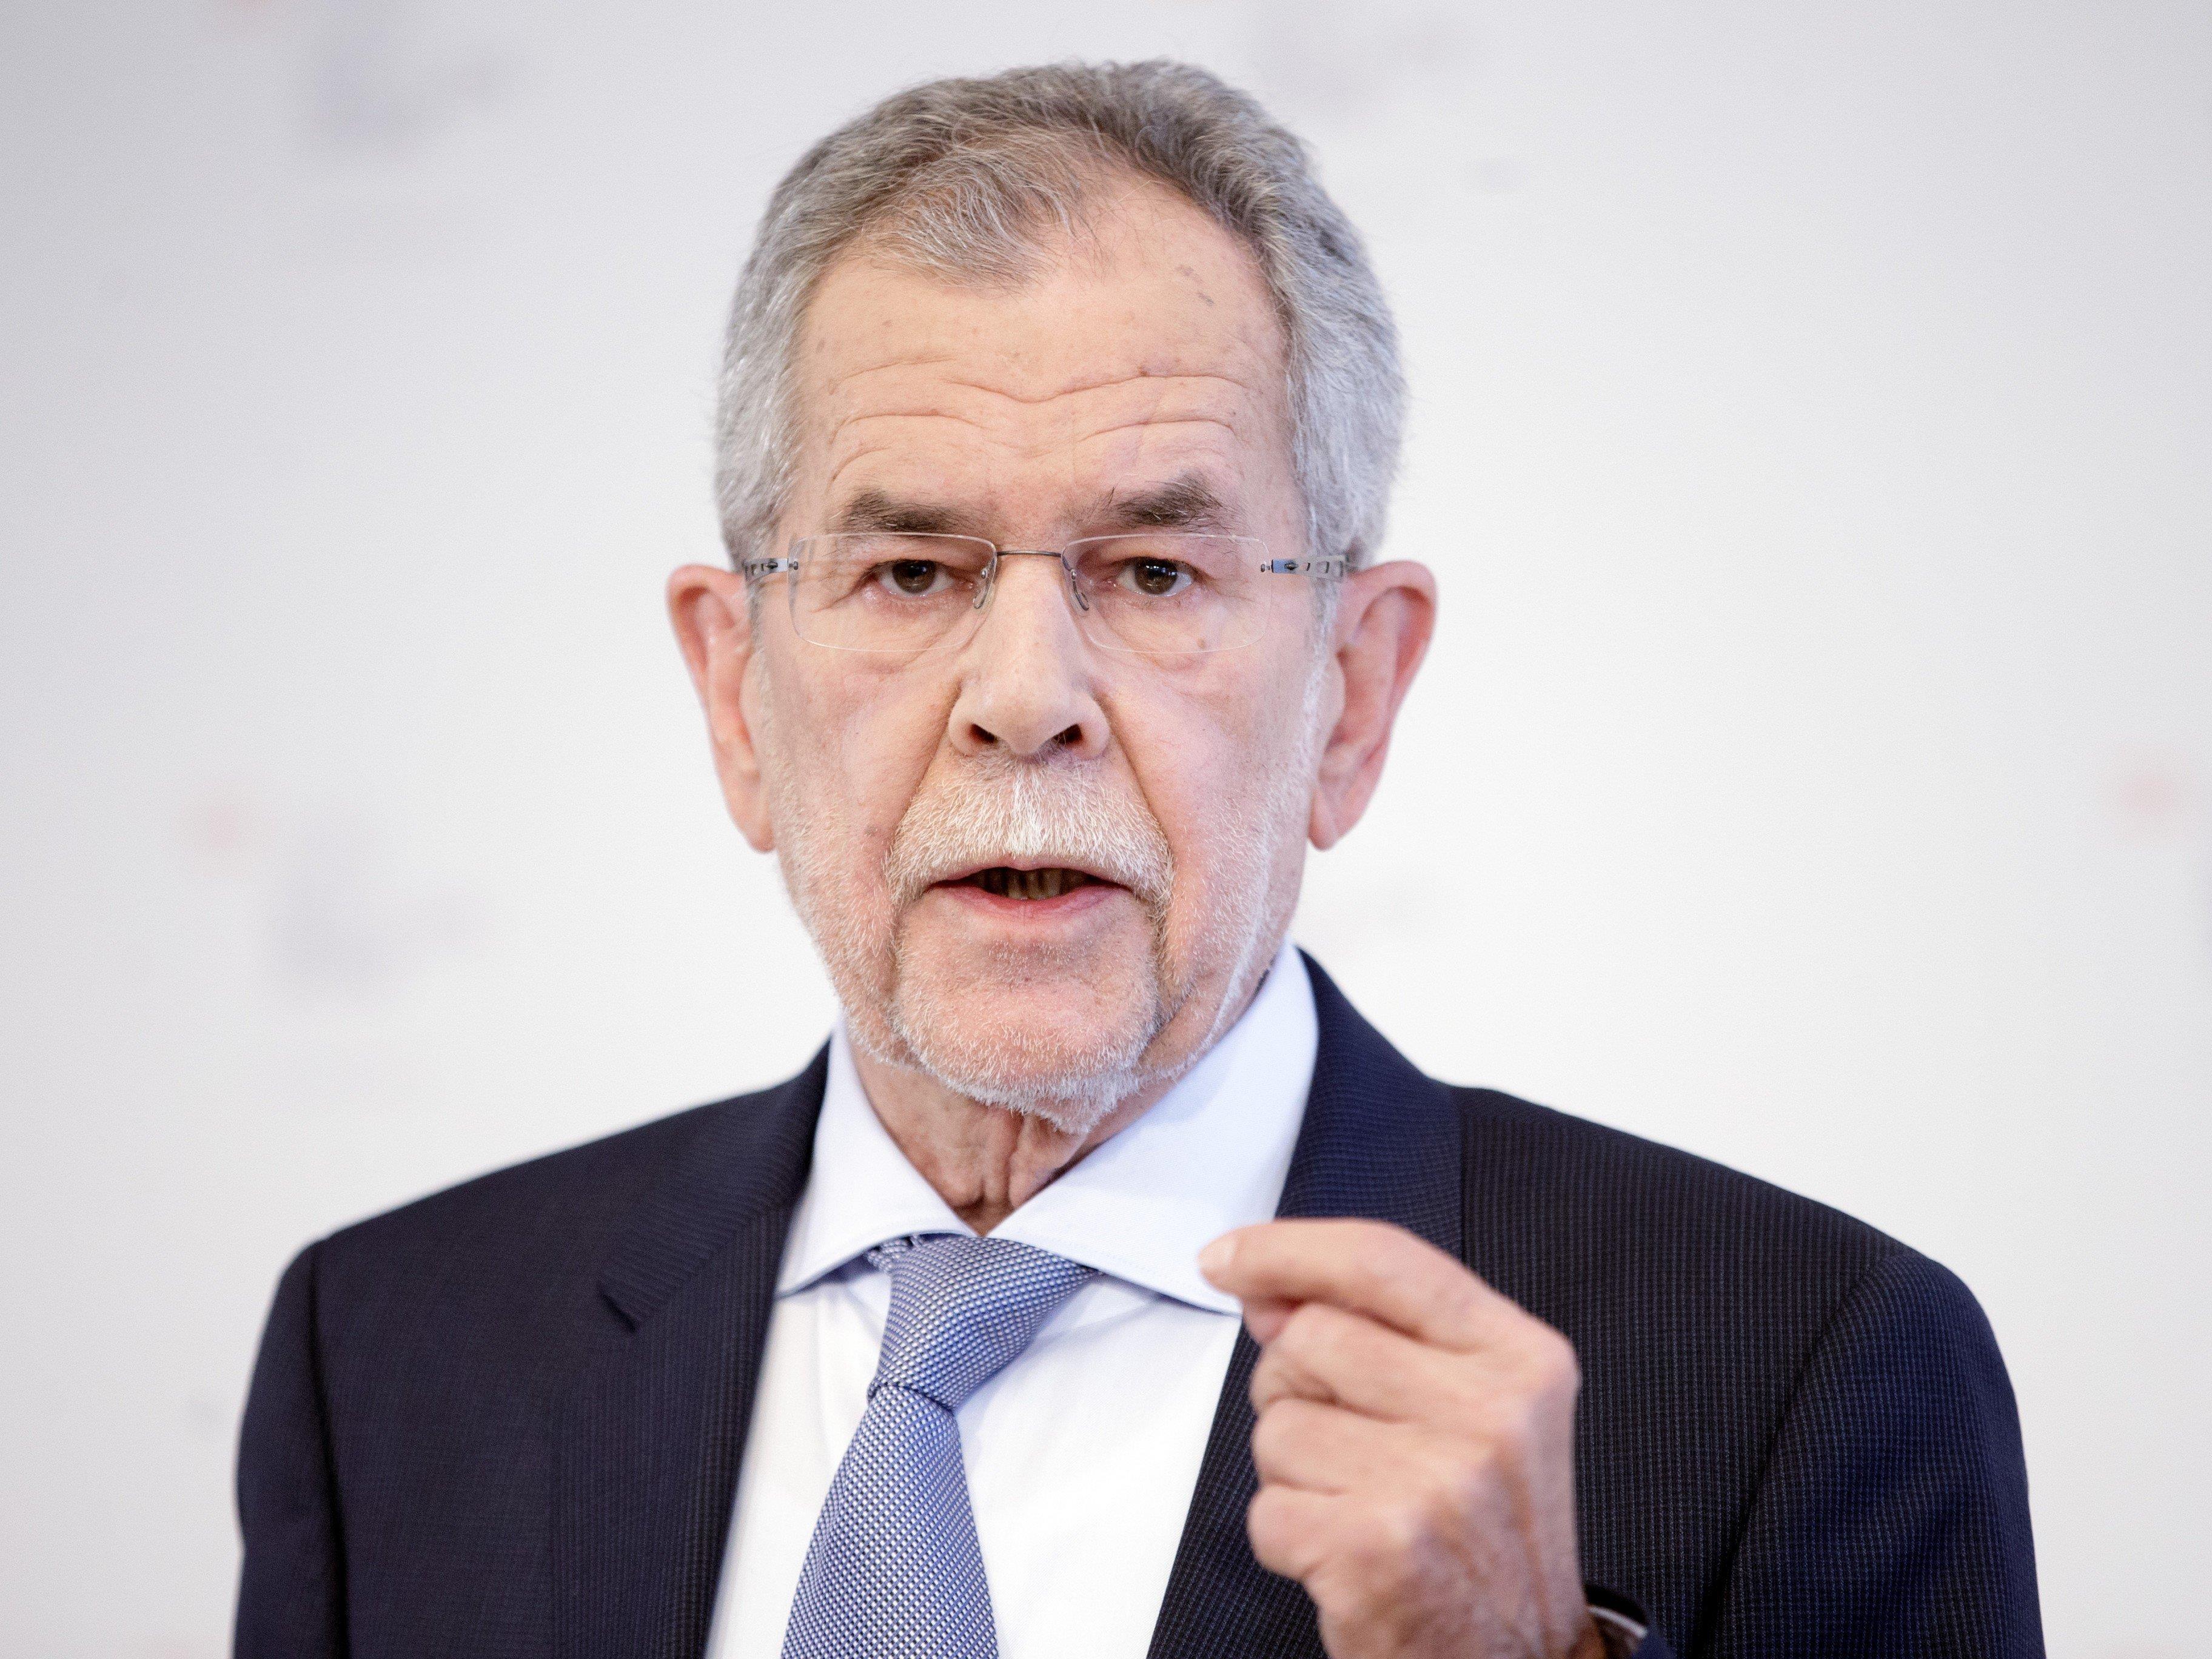 BP-Wahl: Van der Bellen würde Grünen-Mitgliedschaft ruhend stellen